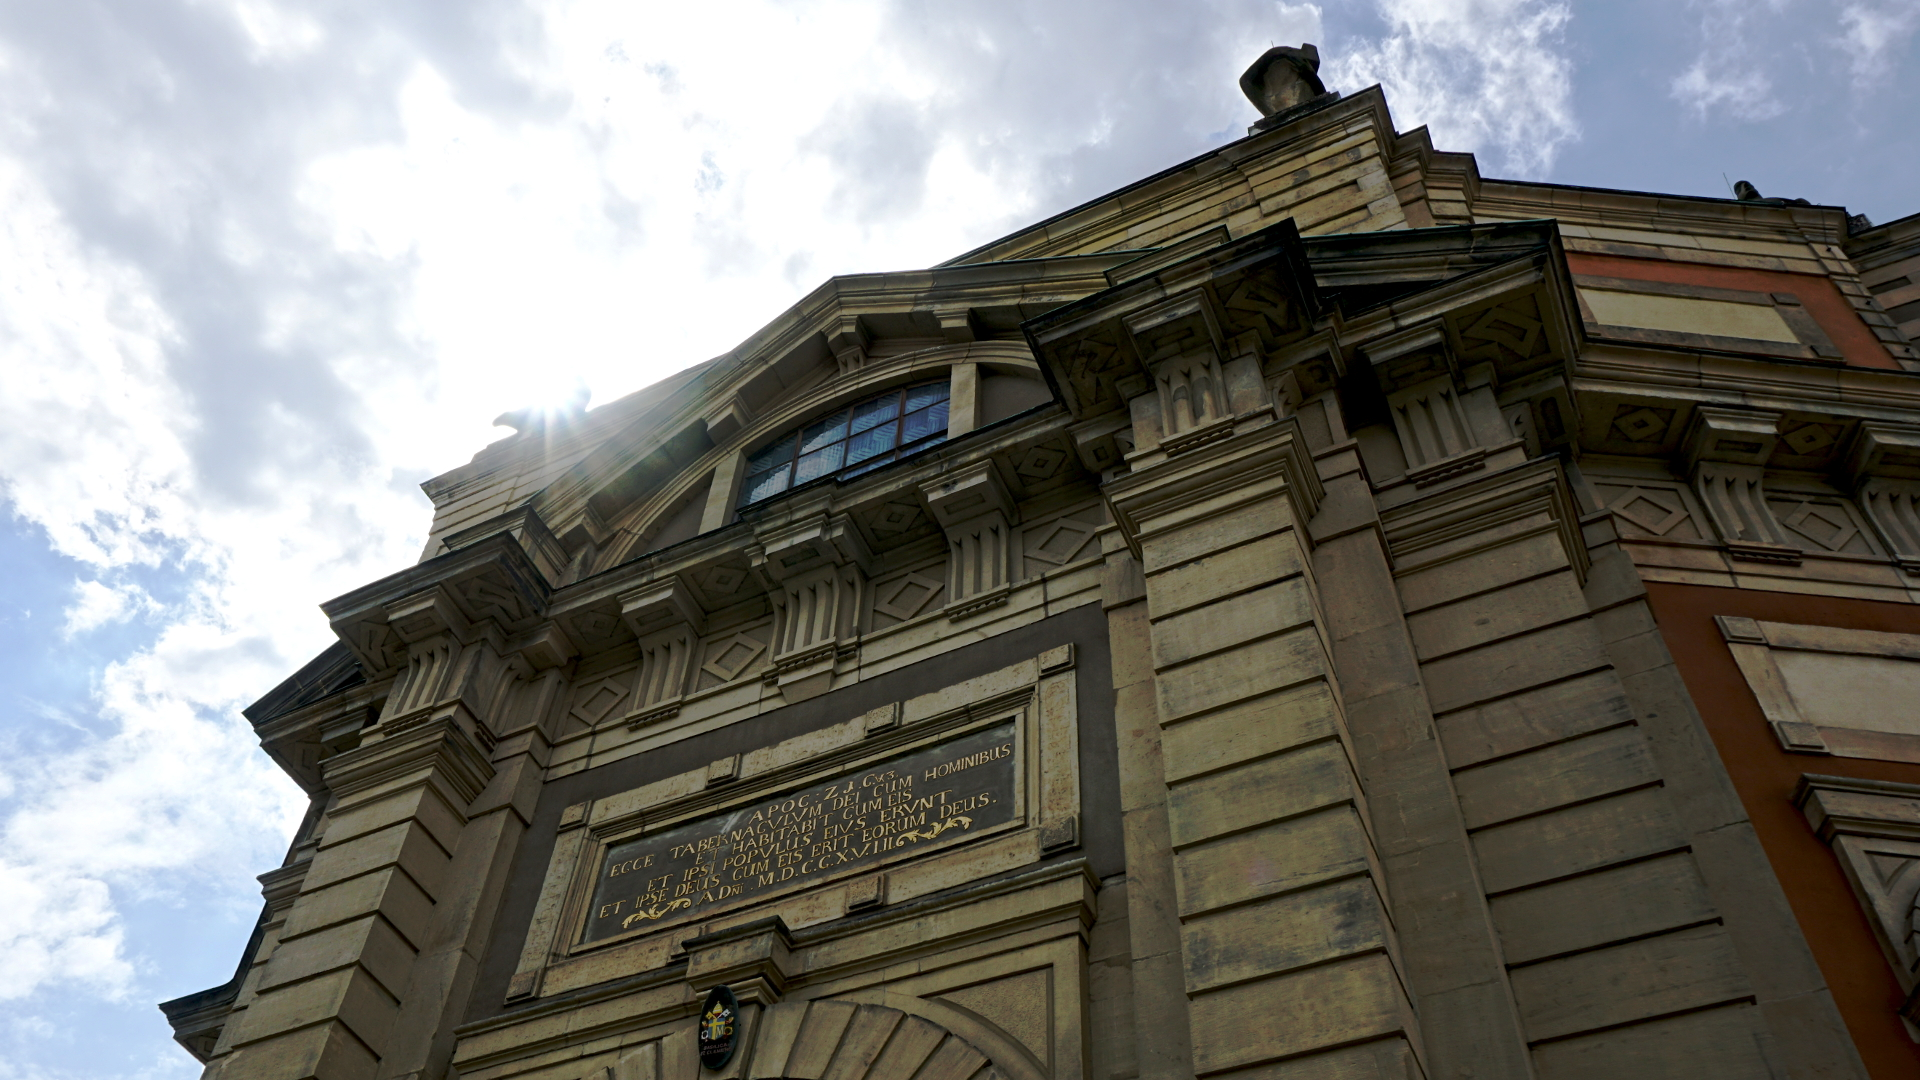 Kirchenfront von St. Clemens, Hannover — Experiment — Blogger